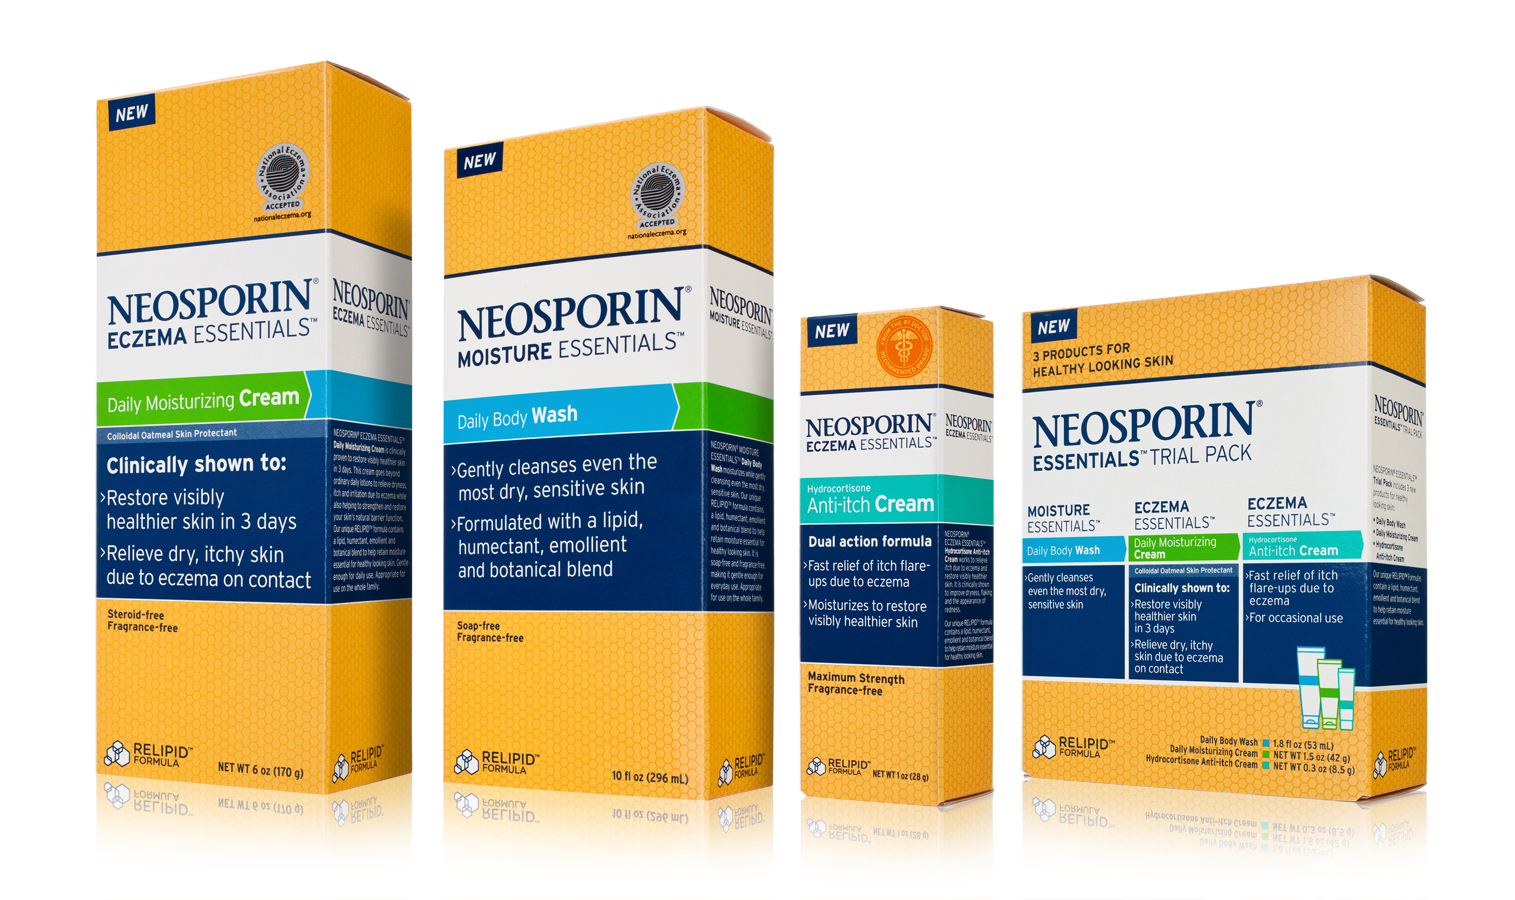 Neosporin eczema essentials text coupon